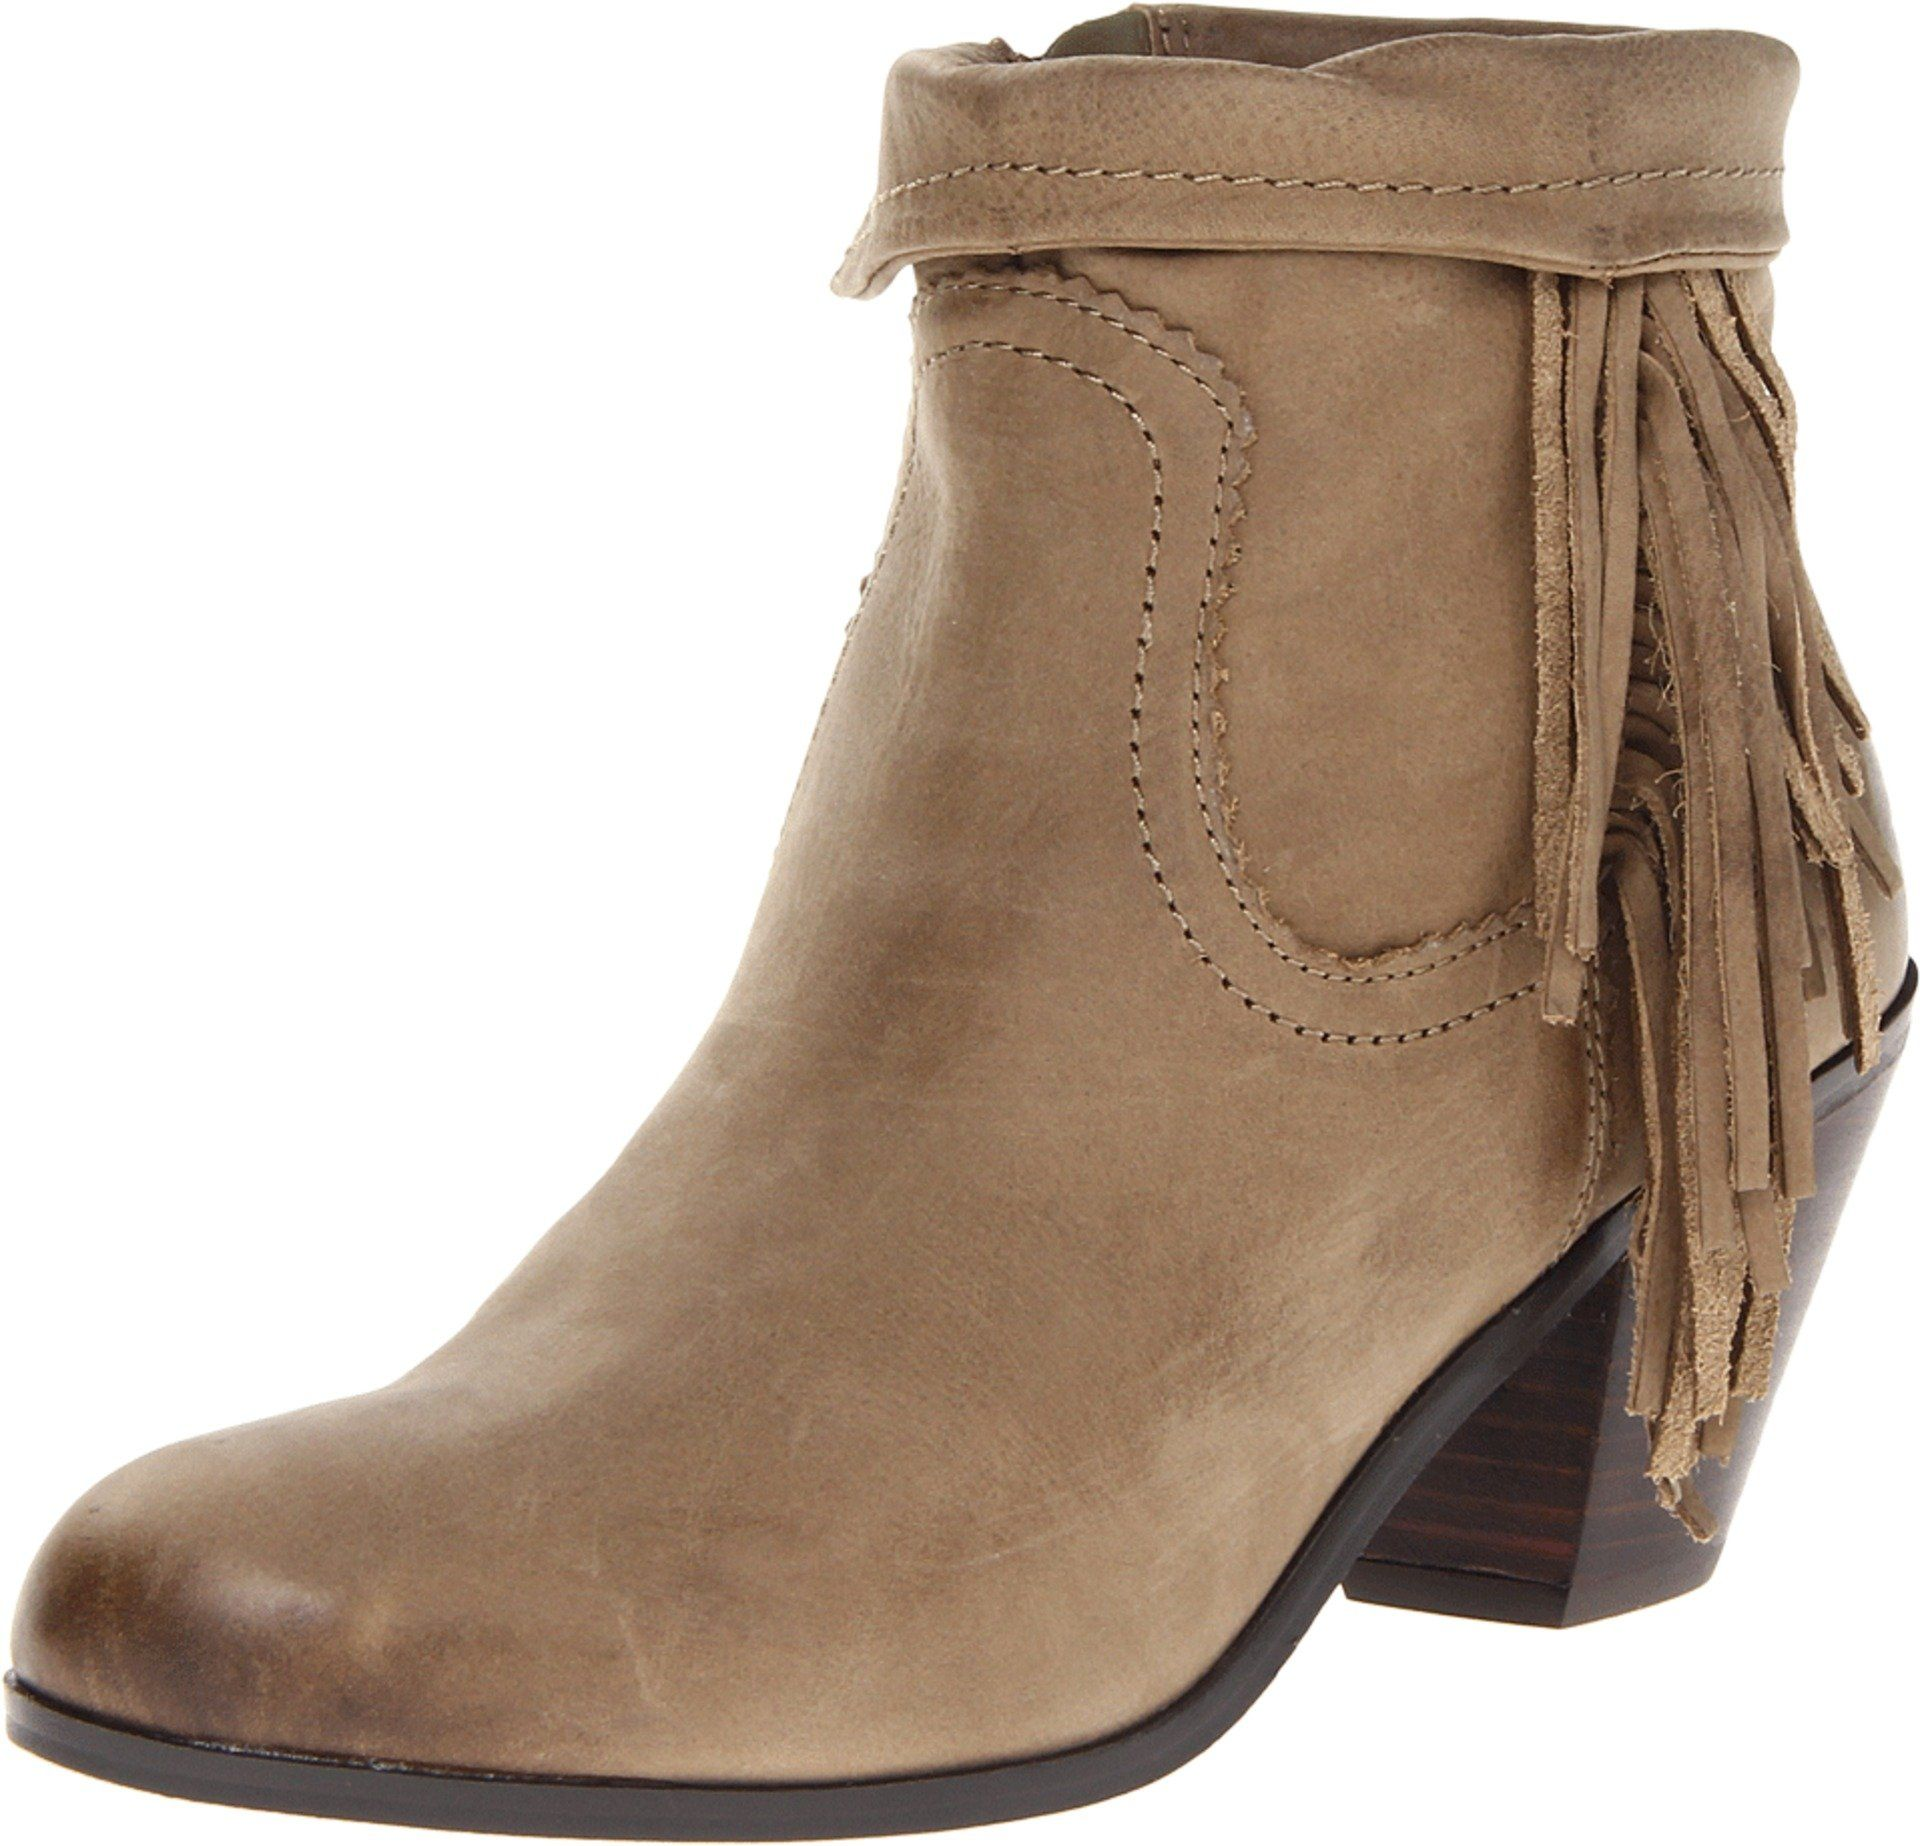 Amazon Com Sam Edelman Women S Louie Ankle Fringe Boot Shoes Boots Fringe Ankle Boots Shoes